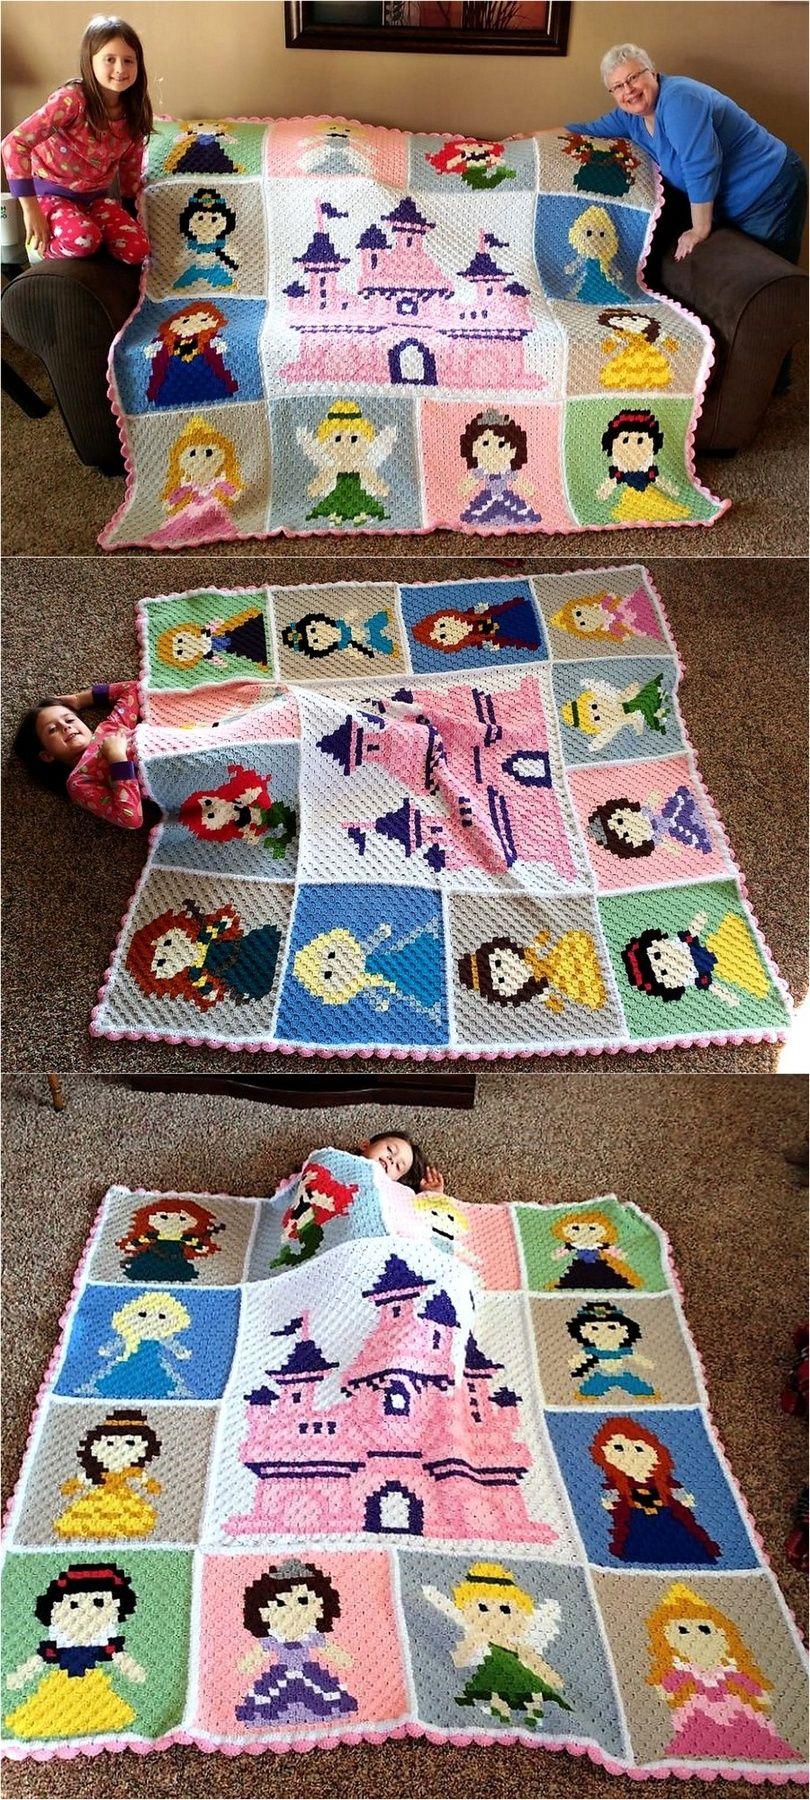 Enhance Your Bed Look with Crocheted Blankets | Cobija, Manta y Tejido